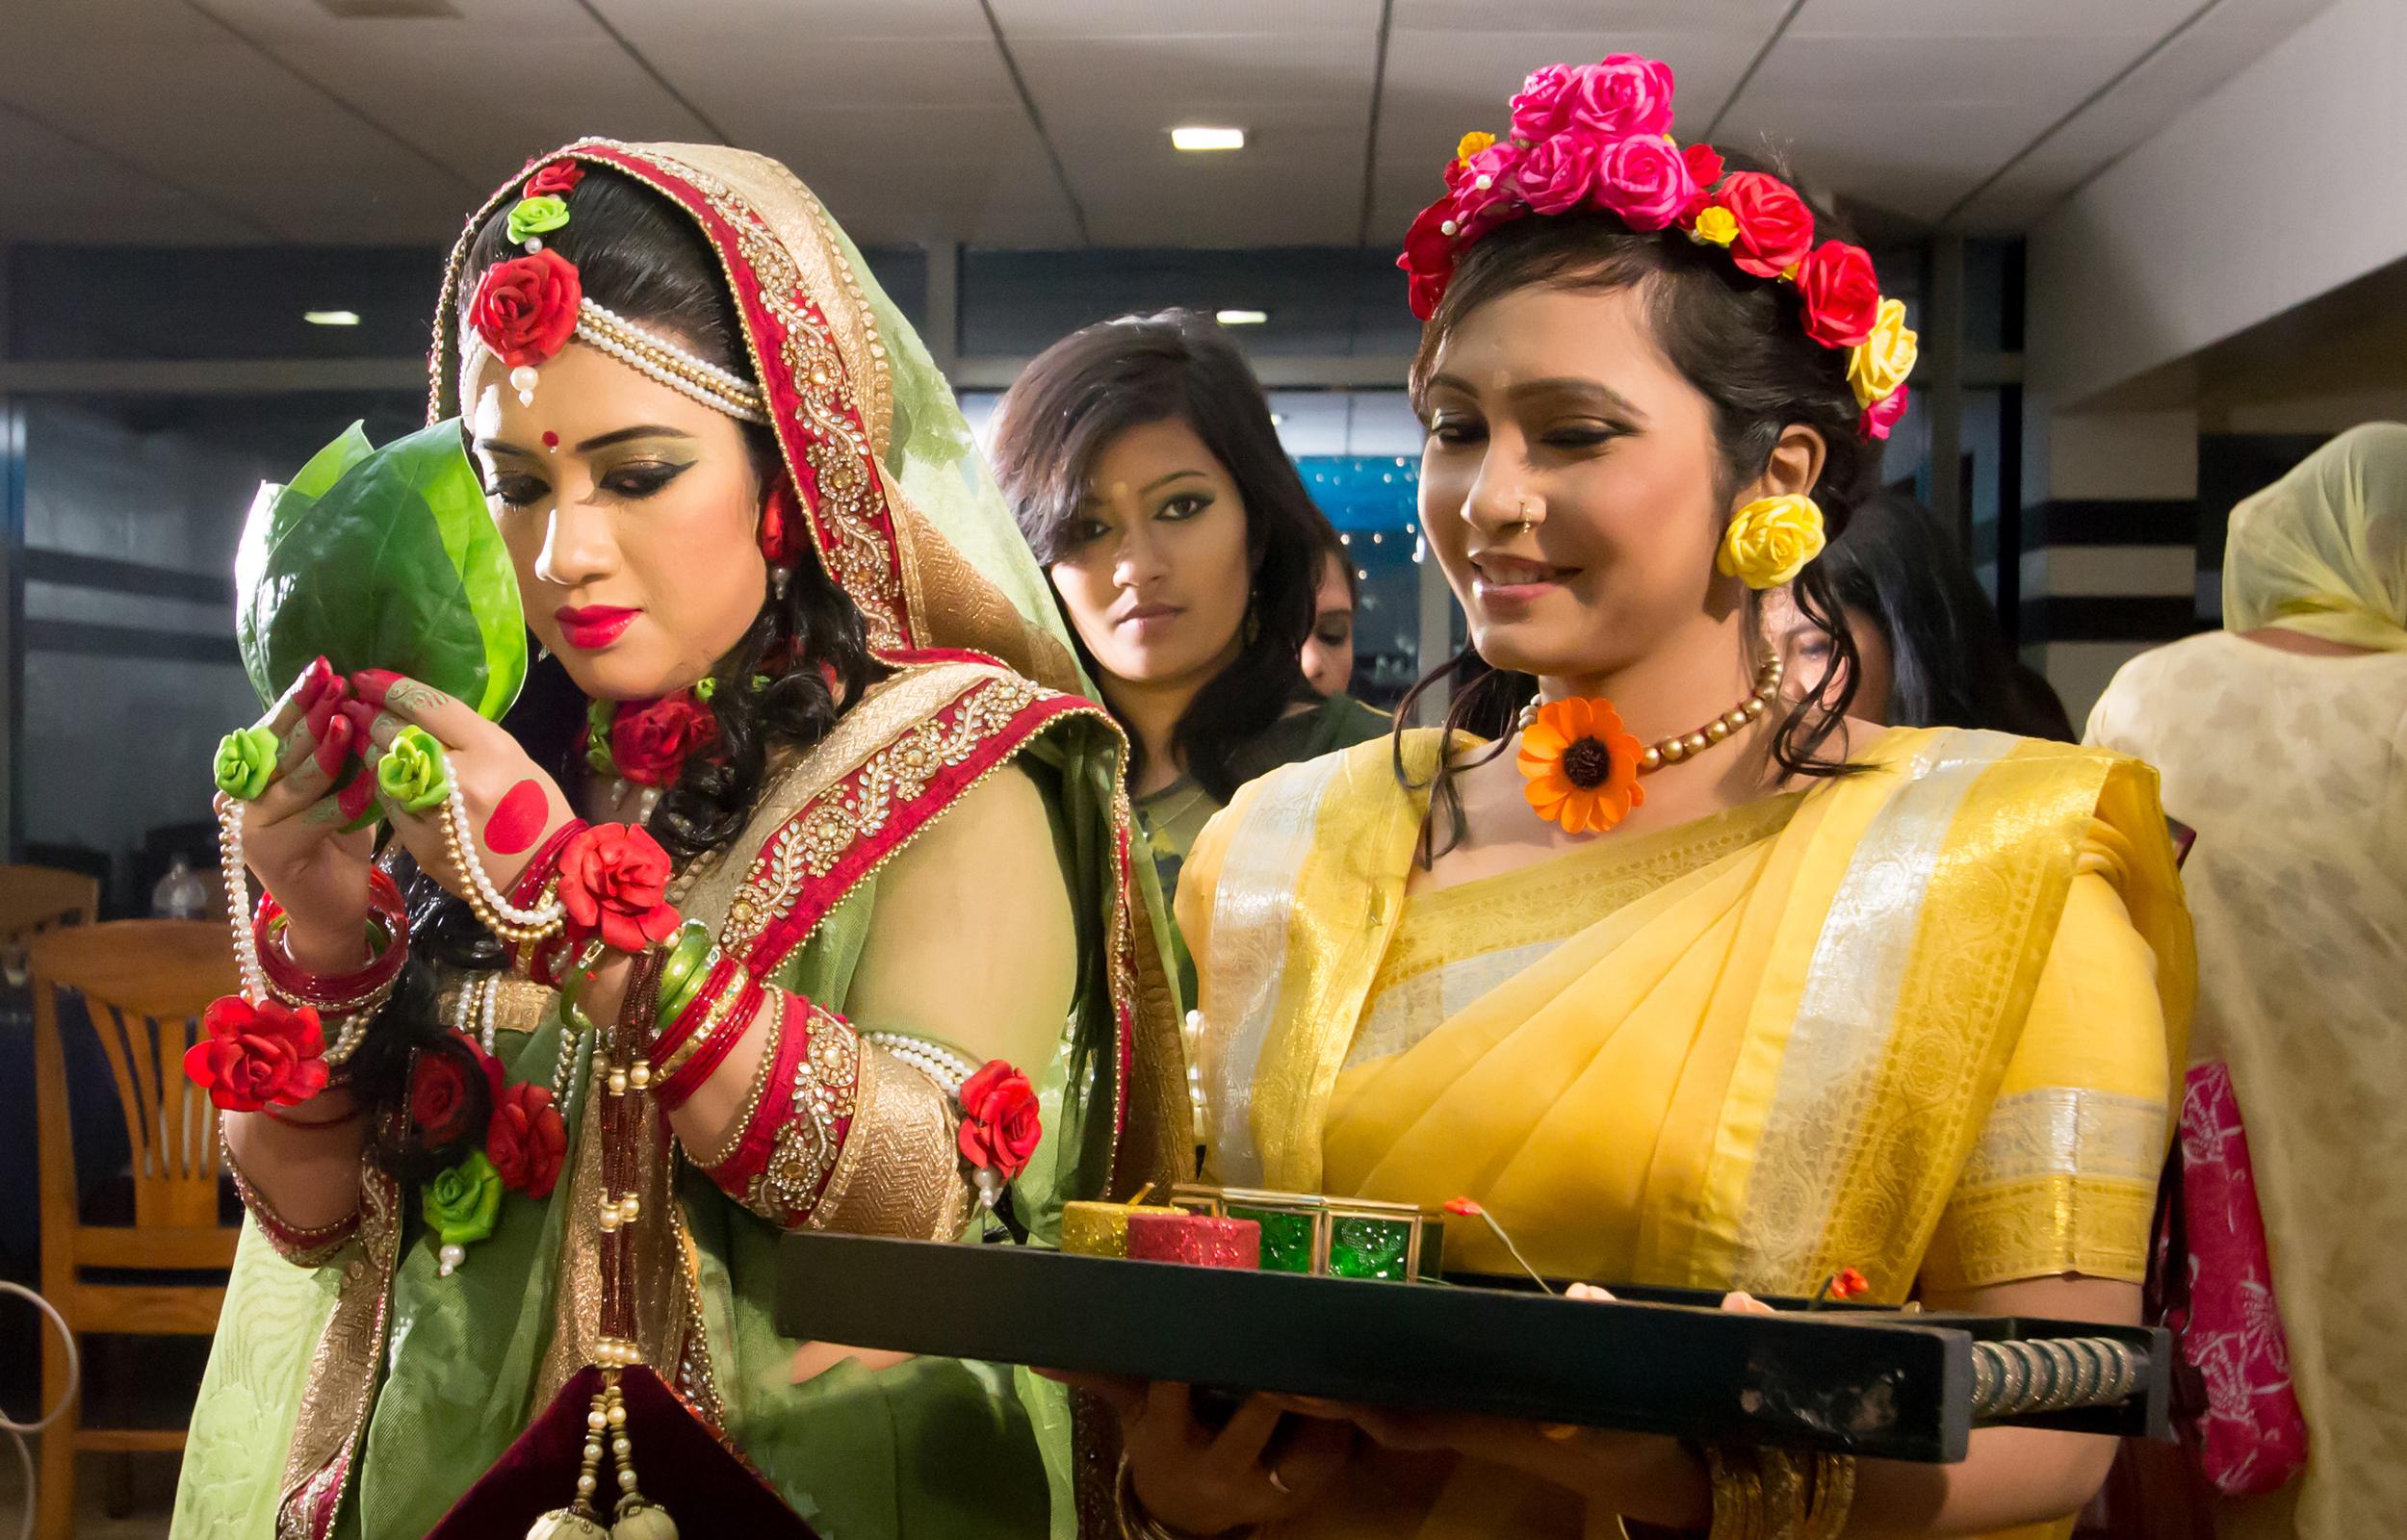 Mehndi Thaals Bengali Weddings : File gaye holud jbi g wikimedia commons